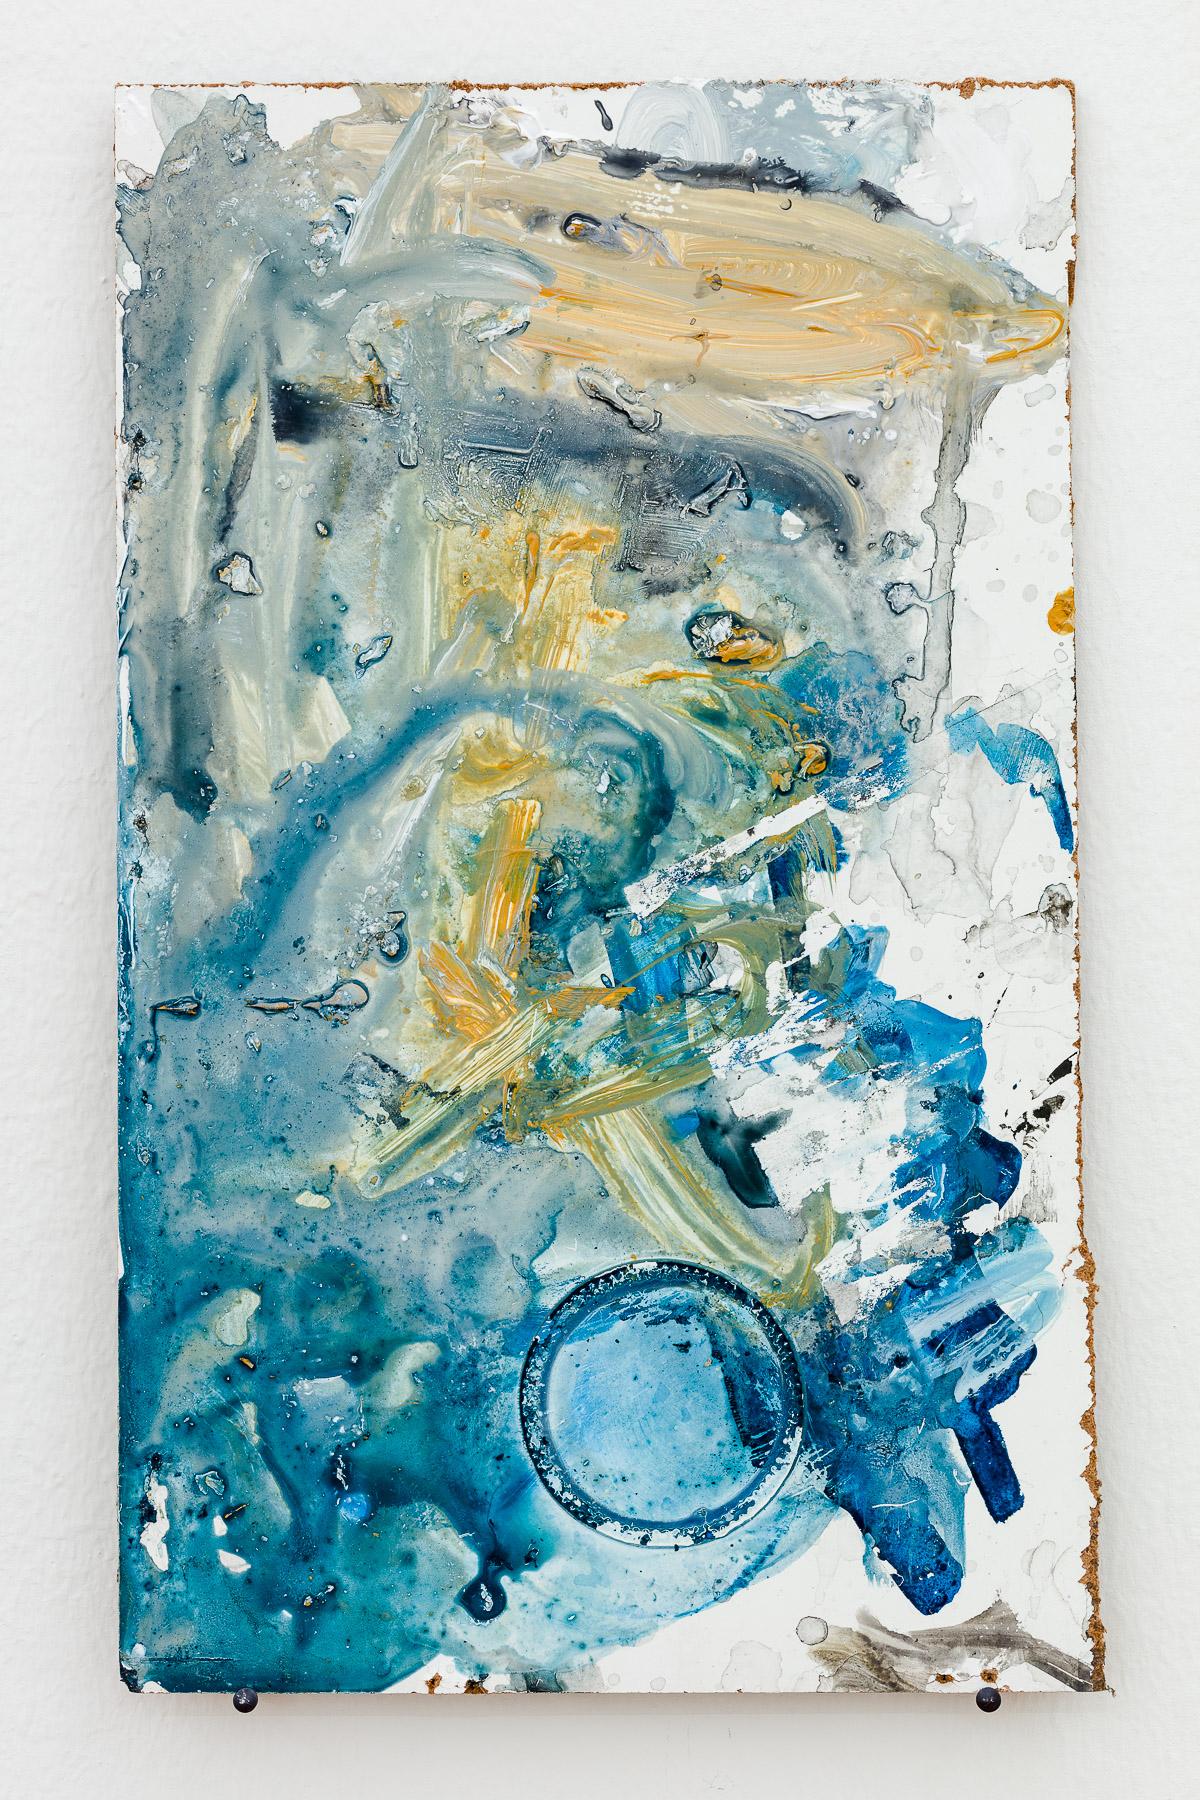 2019_05_20_Elke-Krystufek_Croy-Nielsen_by-kunst-dokumentation-com_014_web.jpg